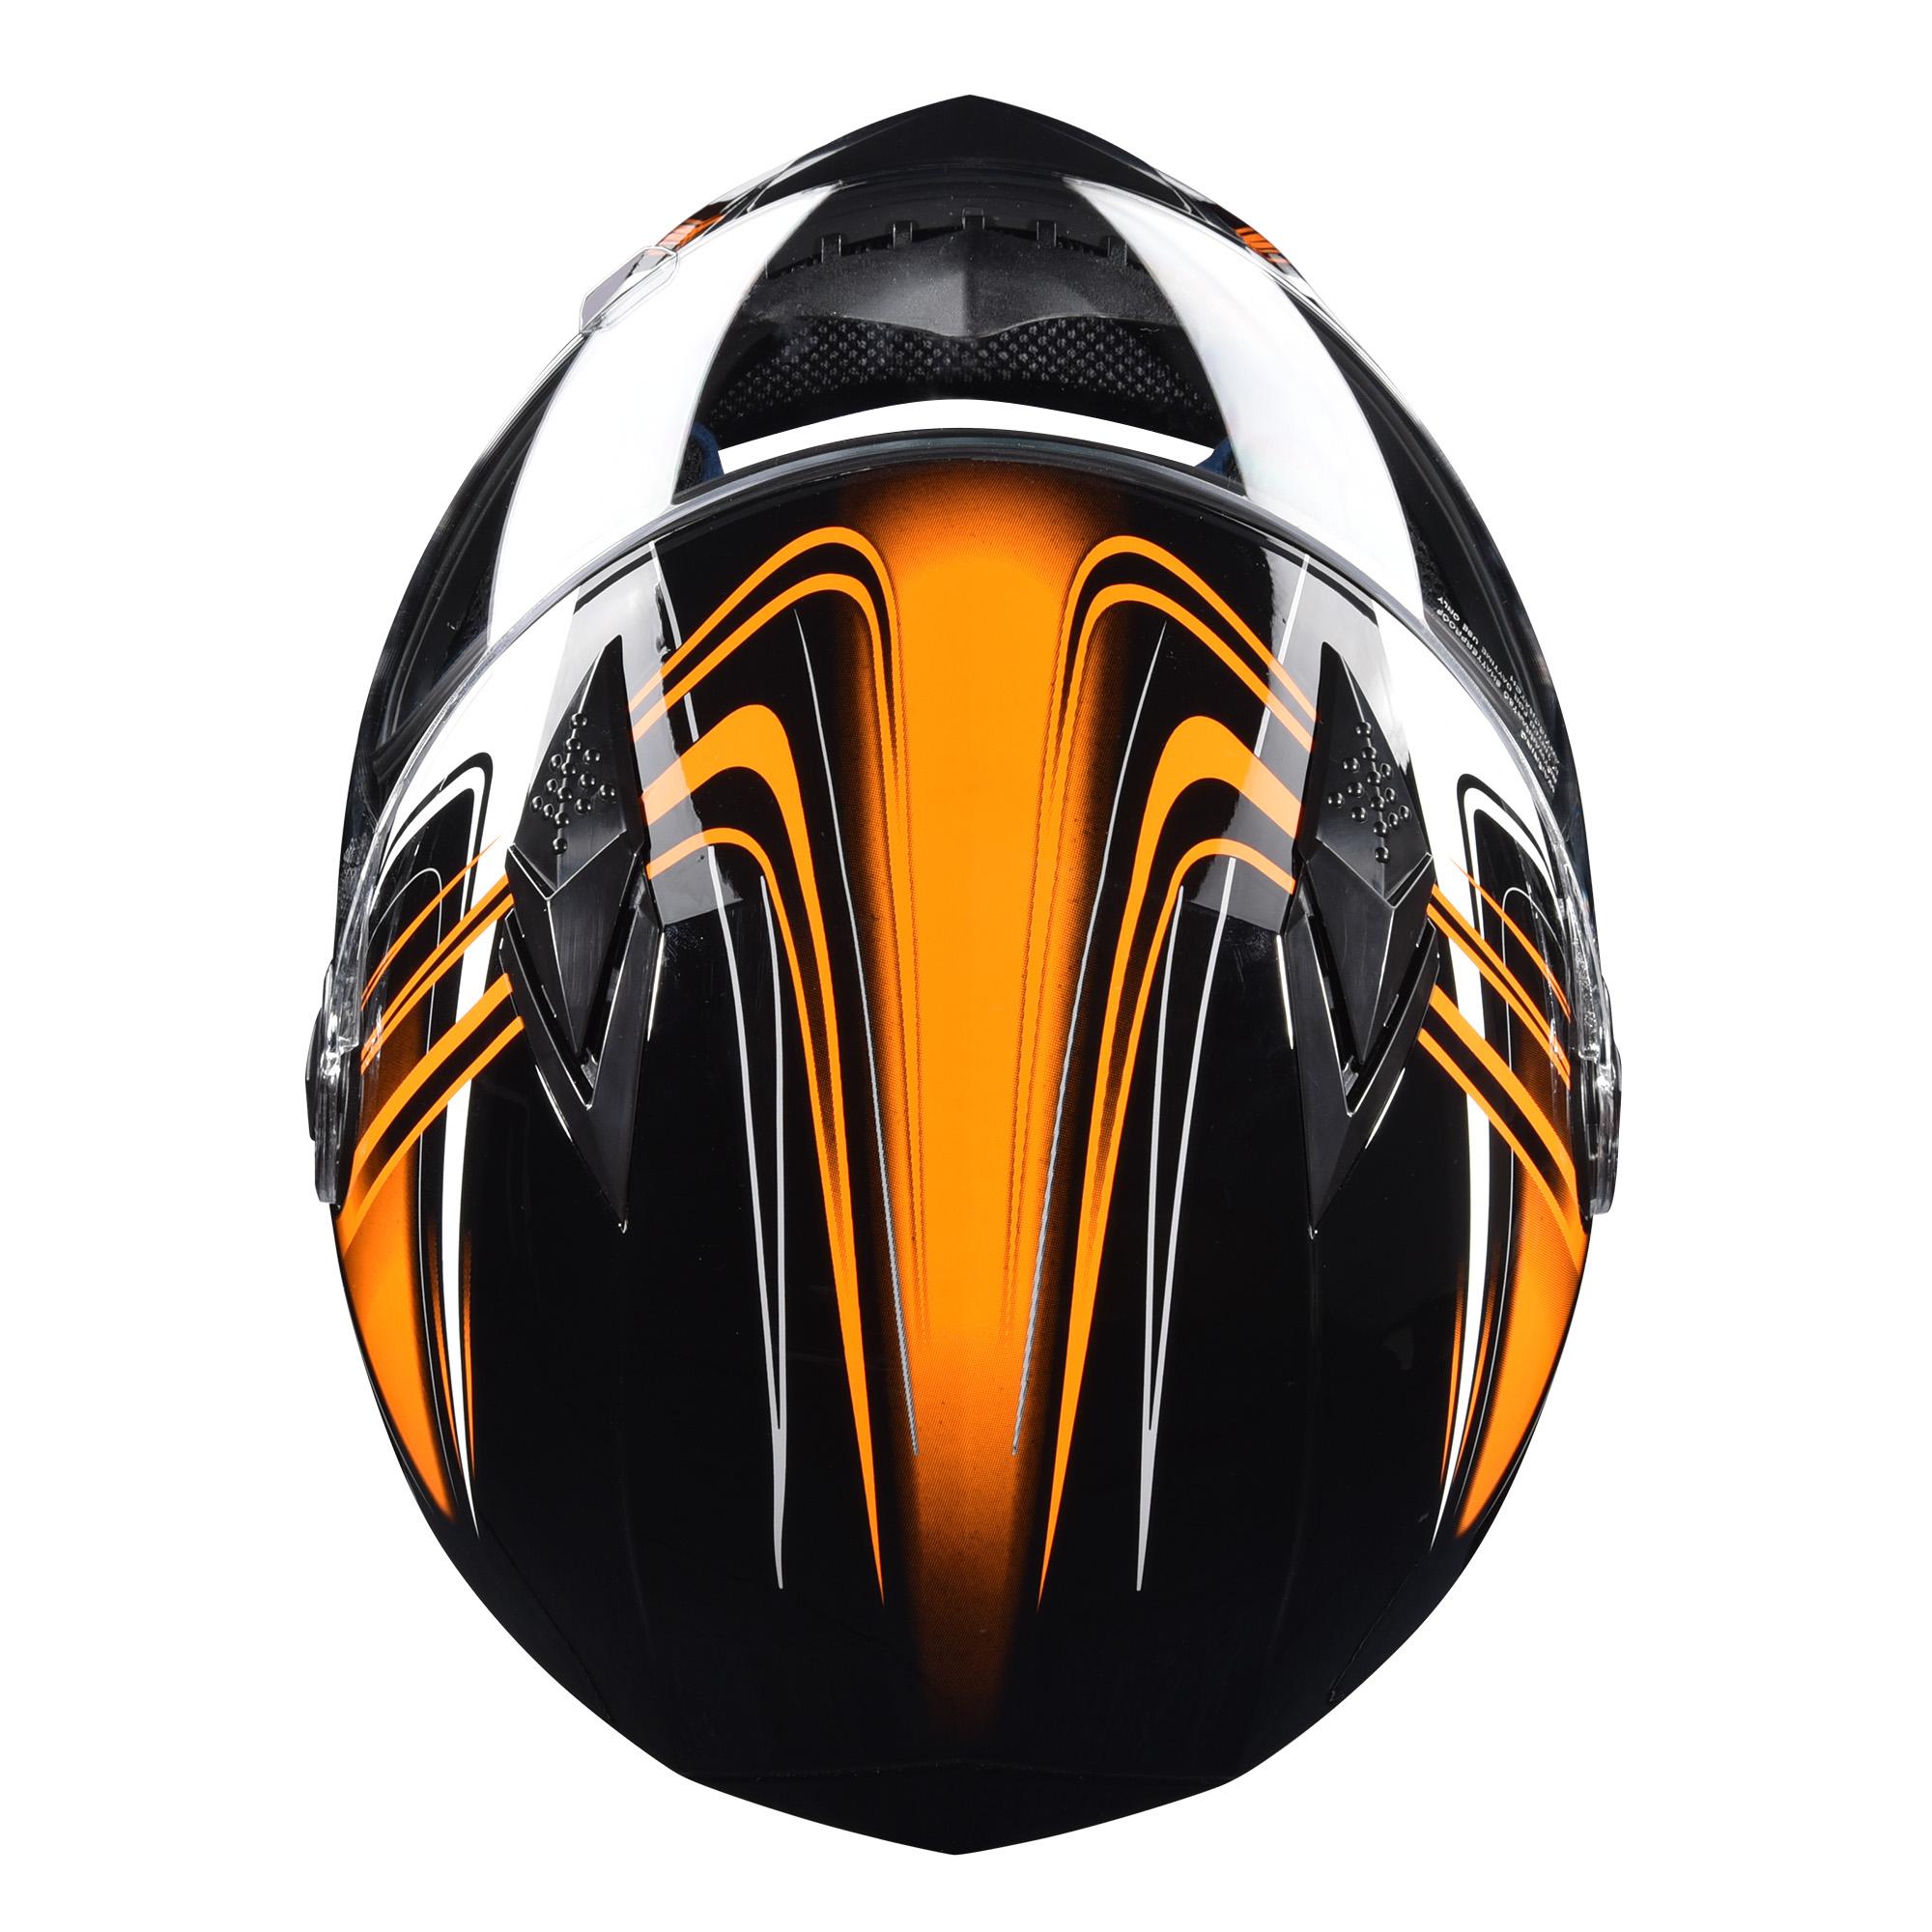 miniature 148 - AHR K12 Full Face Motorcycle Helmet DOT Air Vents Clear Visor Racing S M L XL